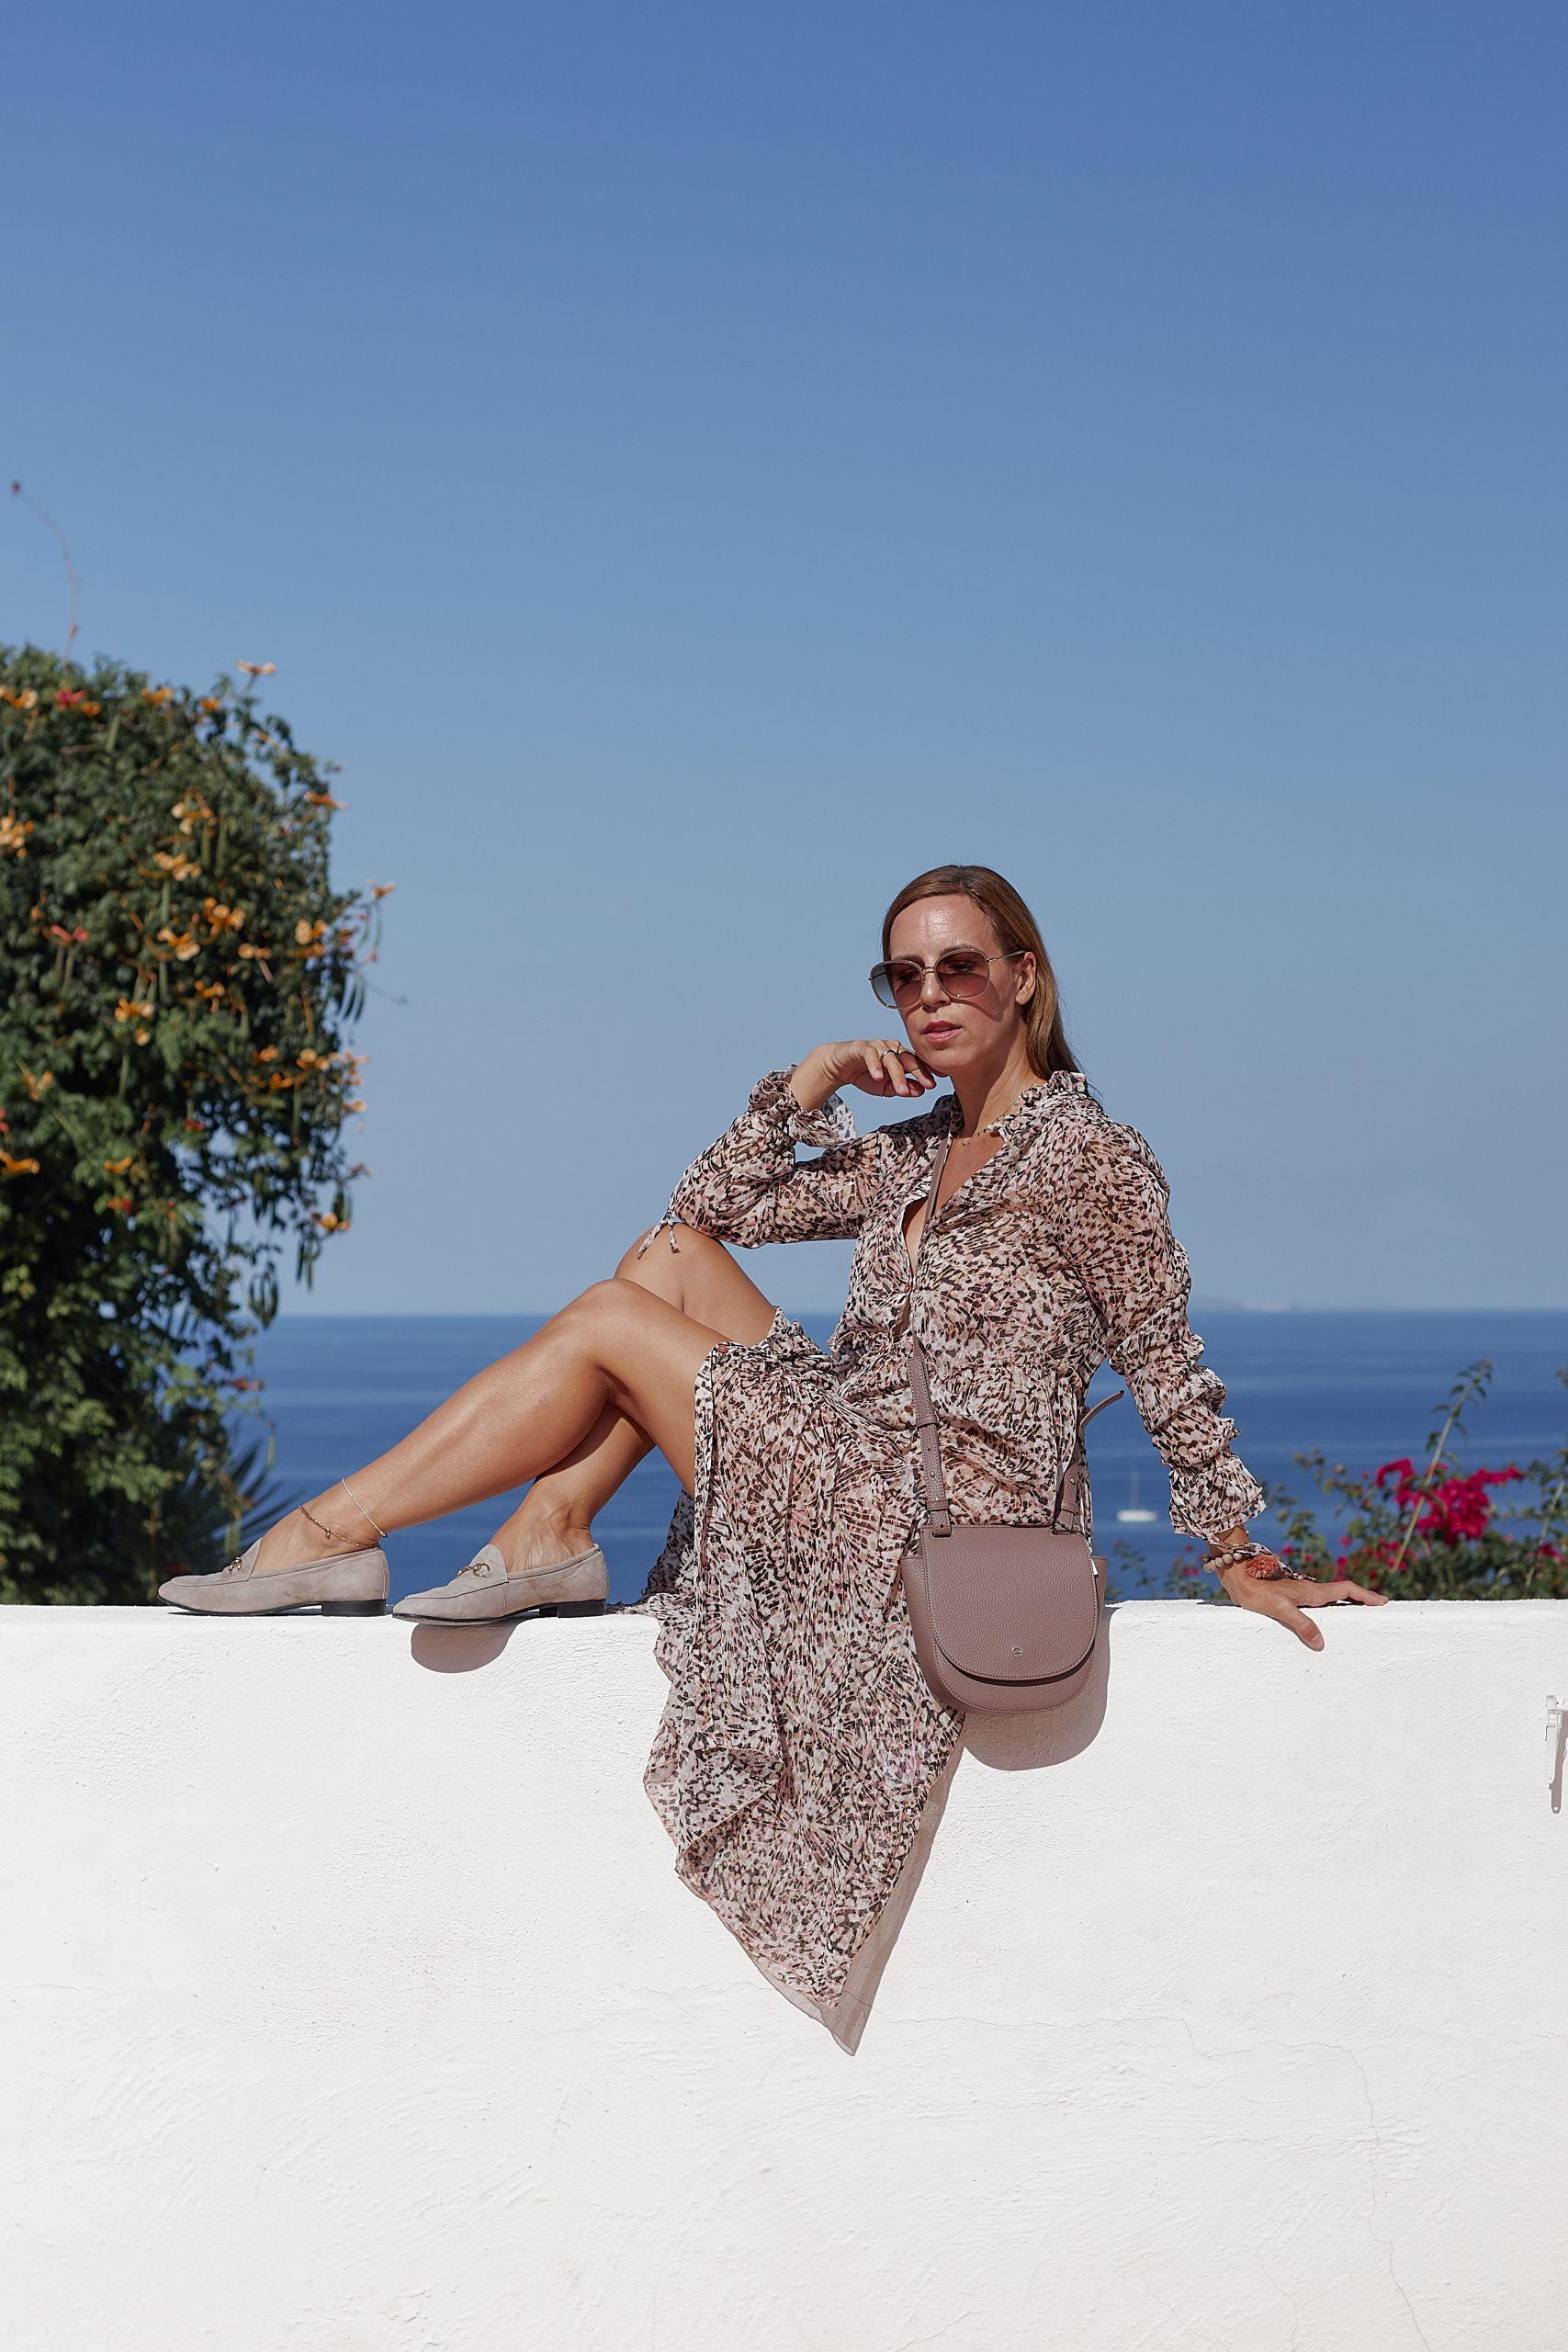 Slipper von Raffaele Riccardi Schuhe zu Maxikleid im Giardino Ravino auf Ischia